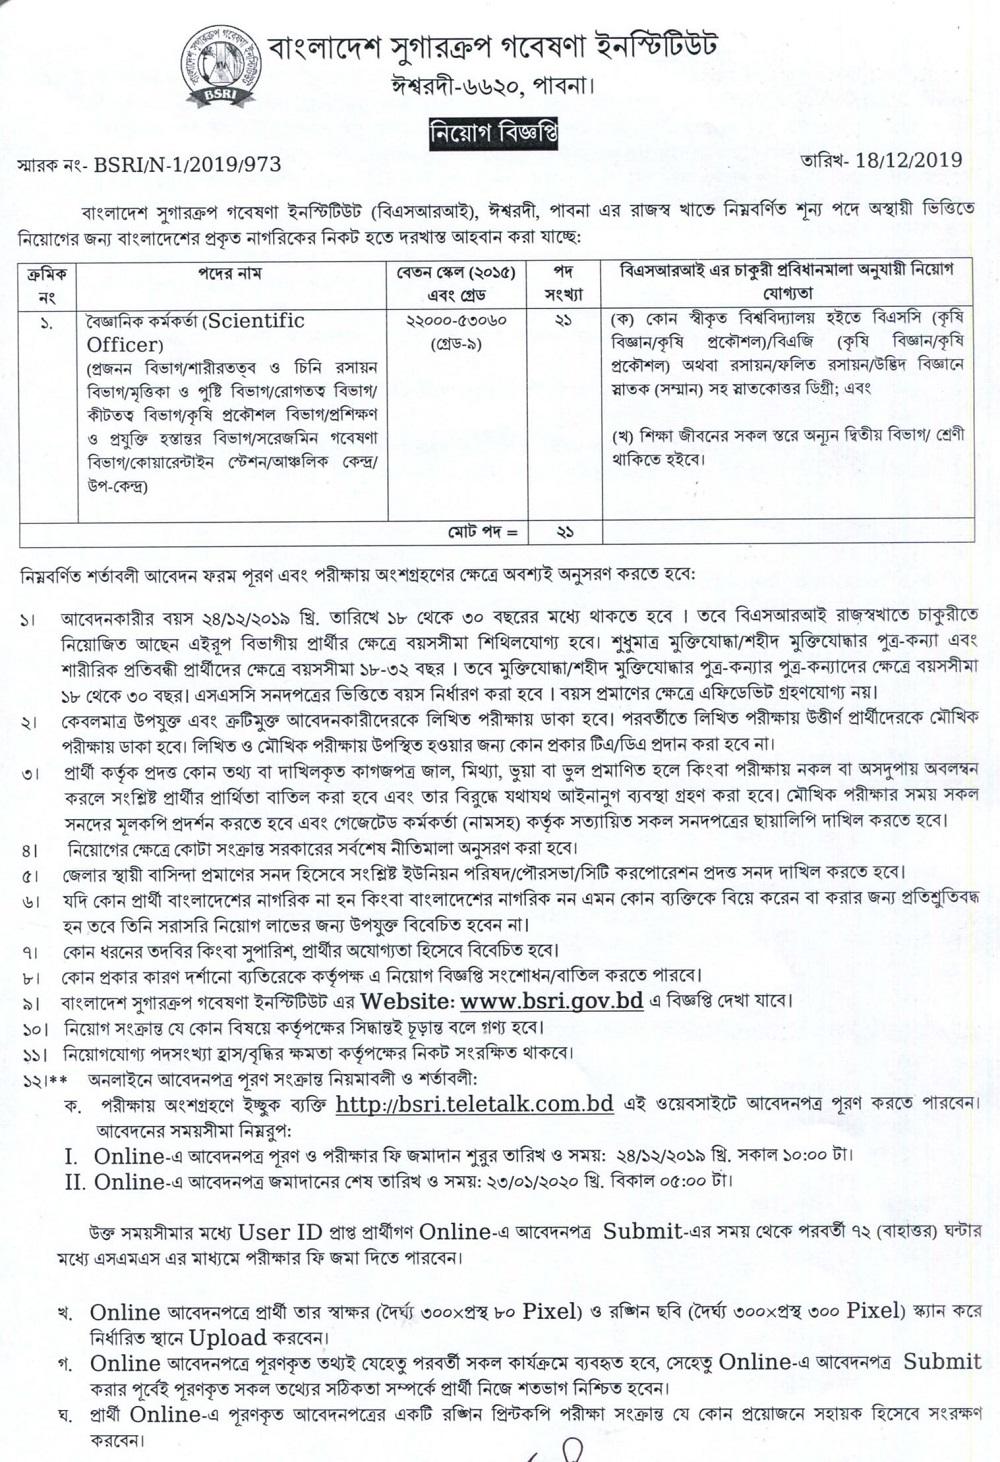 BSRI Job Circular- bsri gov bd